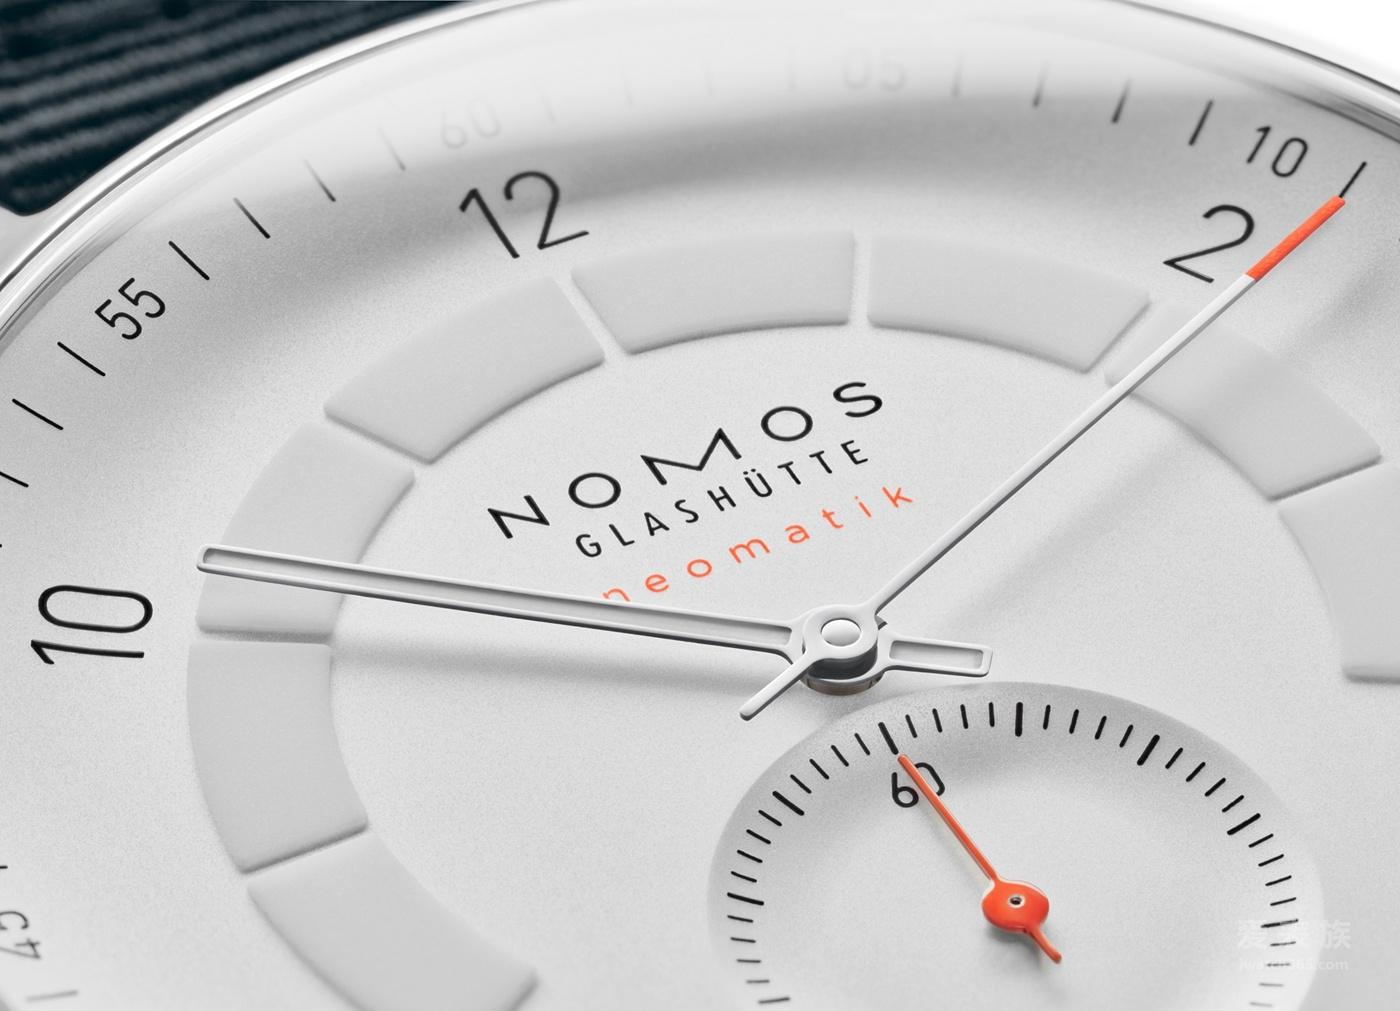 NOMOS Autobahn neomatik 41 date腕表 荣获2018红点设计大奖